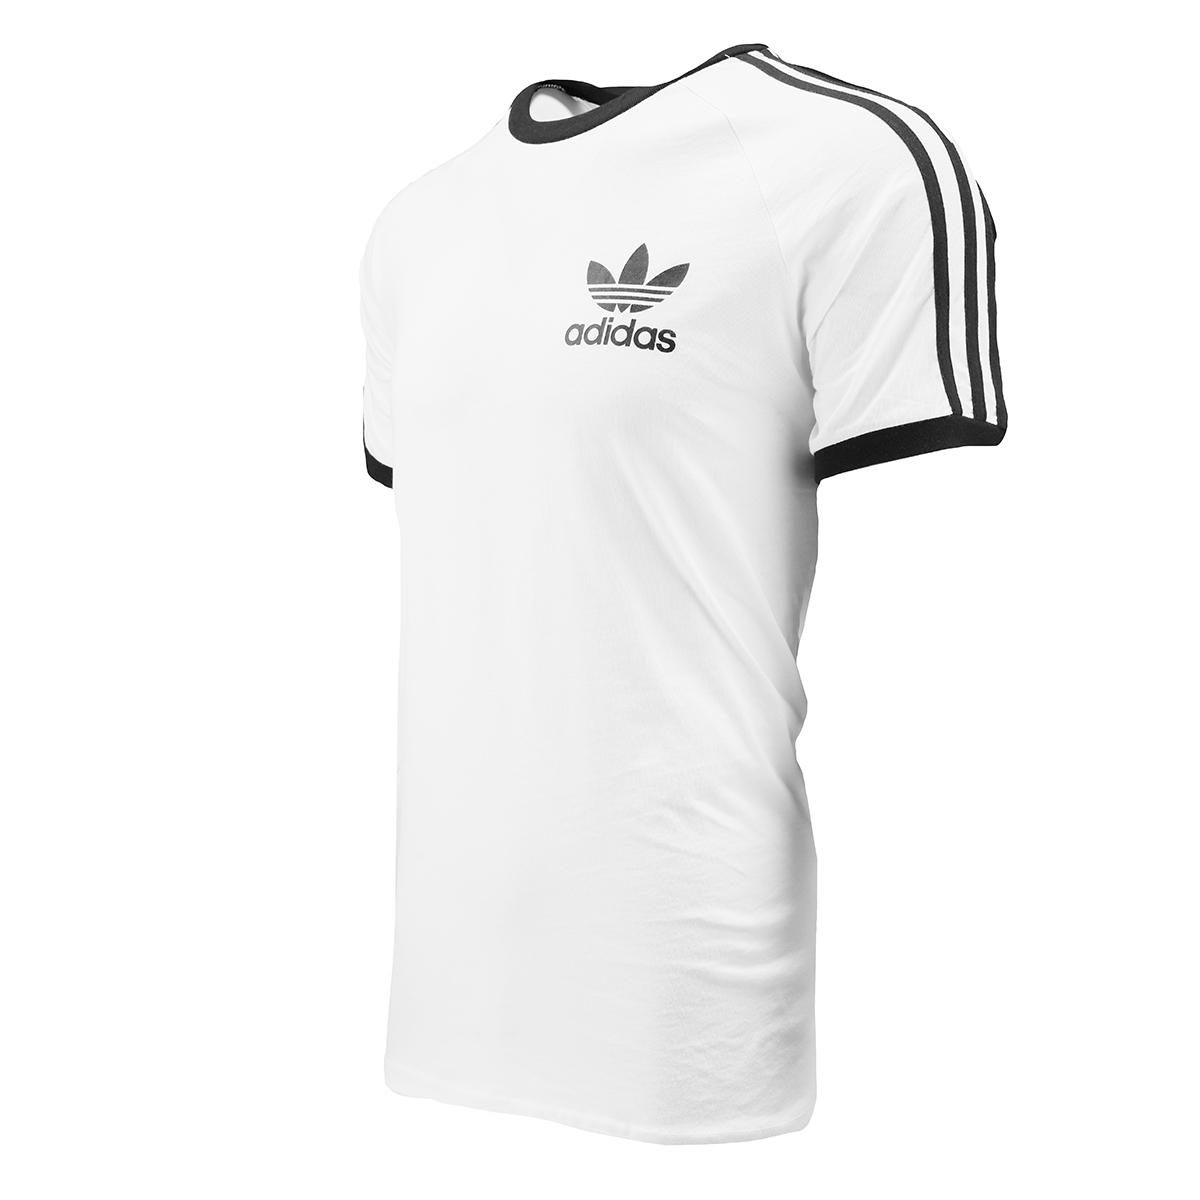 adidas-Originals-Men-039-s-California-Tee thumbnail 24